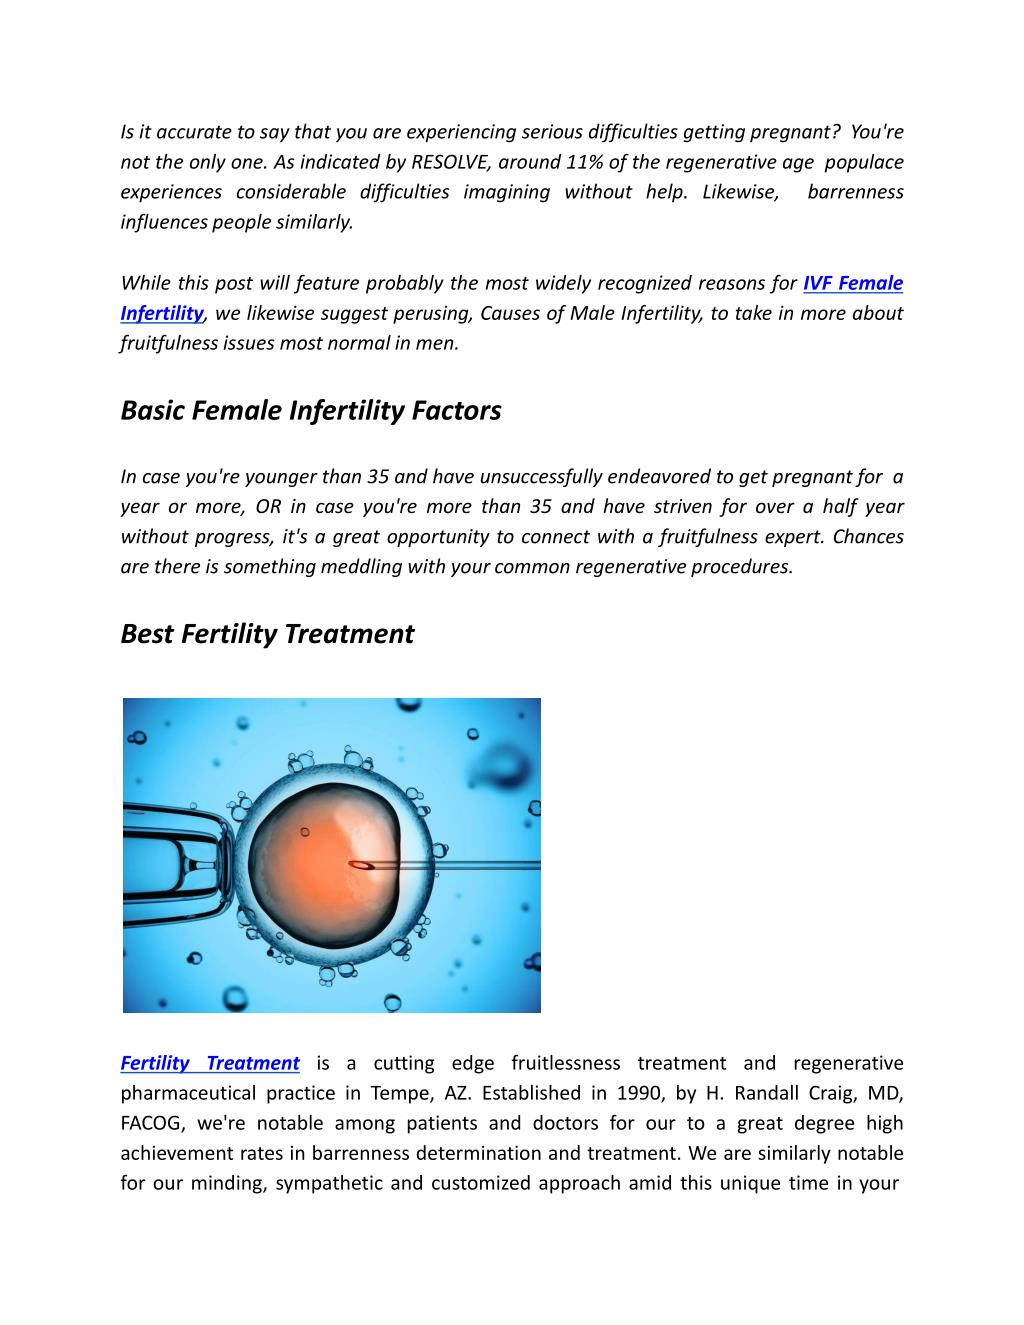 PPT - Female Infertility Treatment | Female Infertility